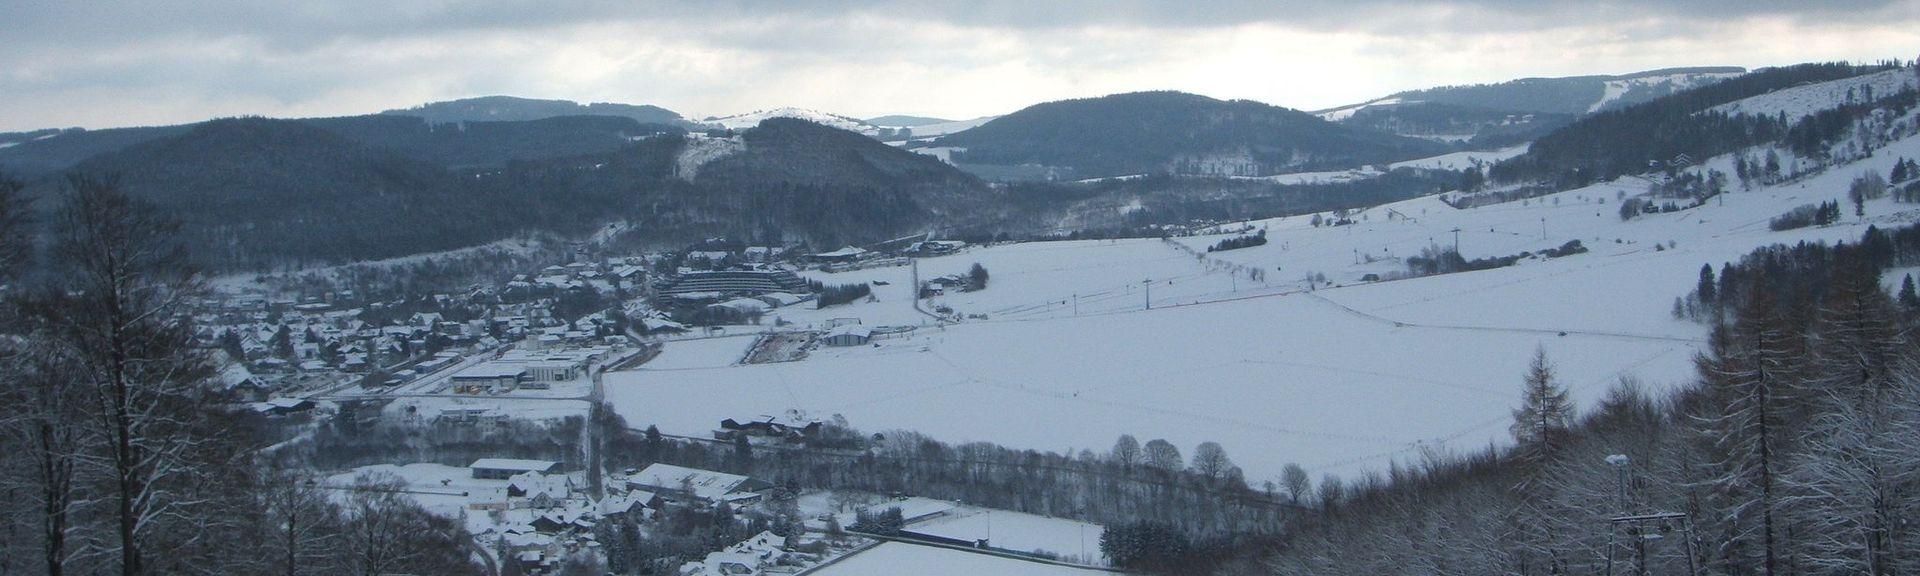 Schwalefeld, Willingen (Upland), Hessen, Duitsland